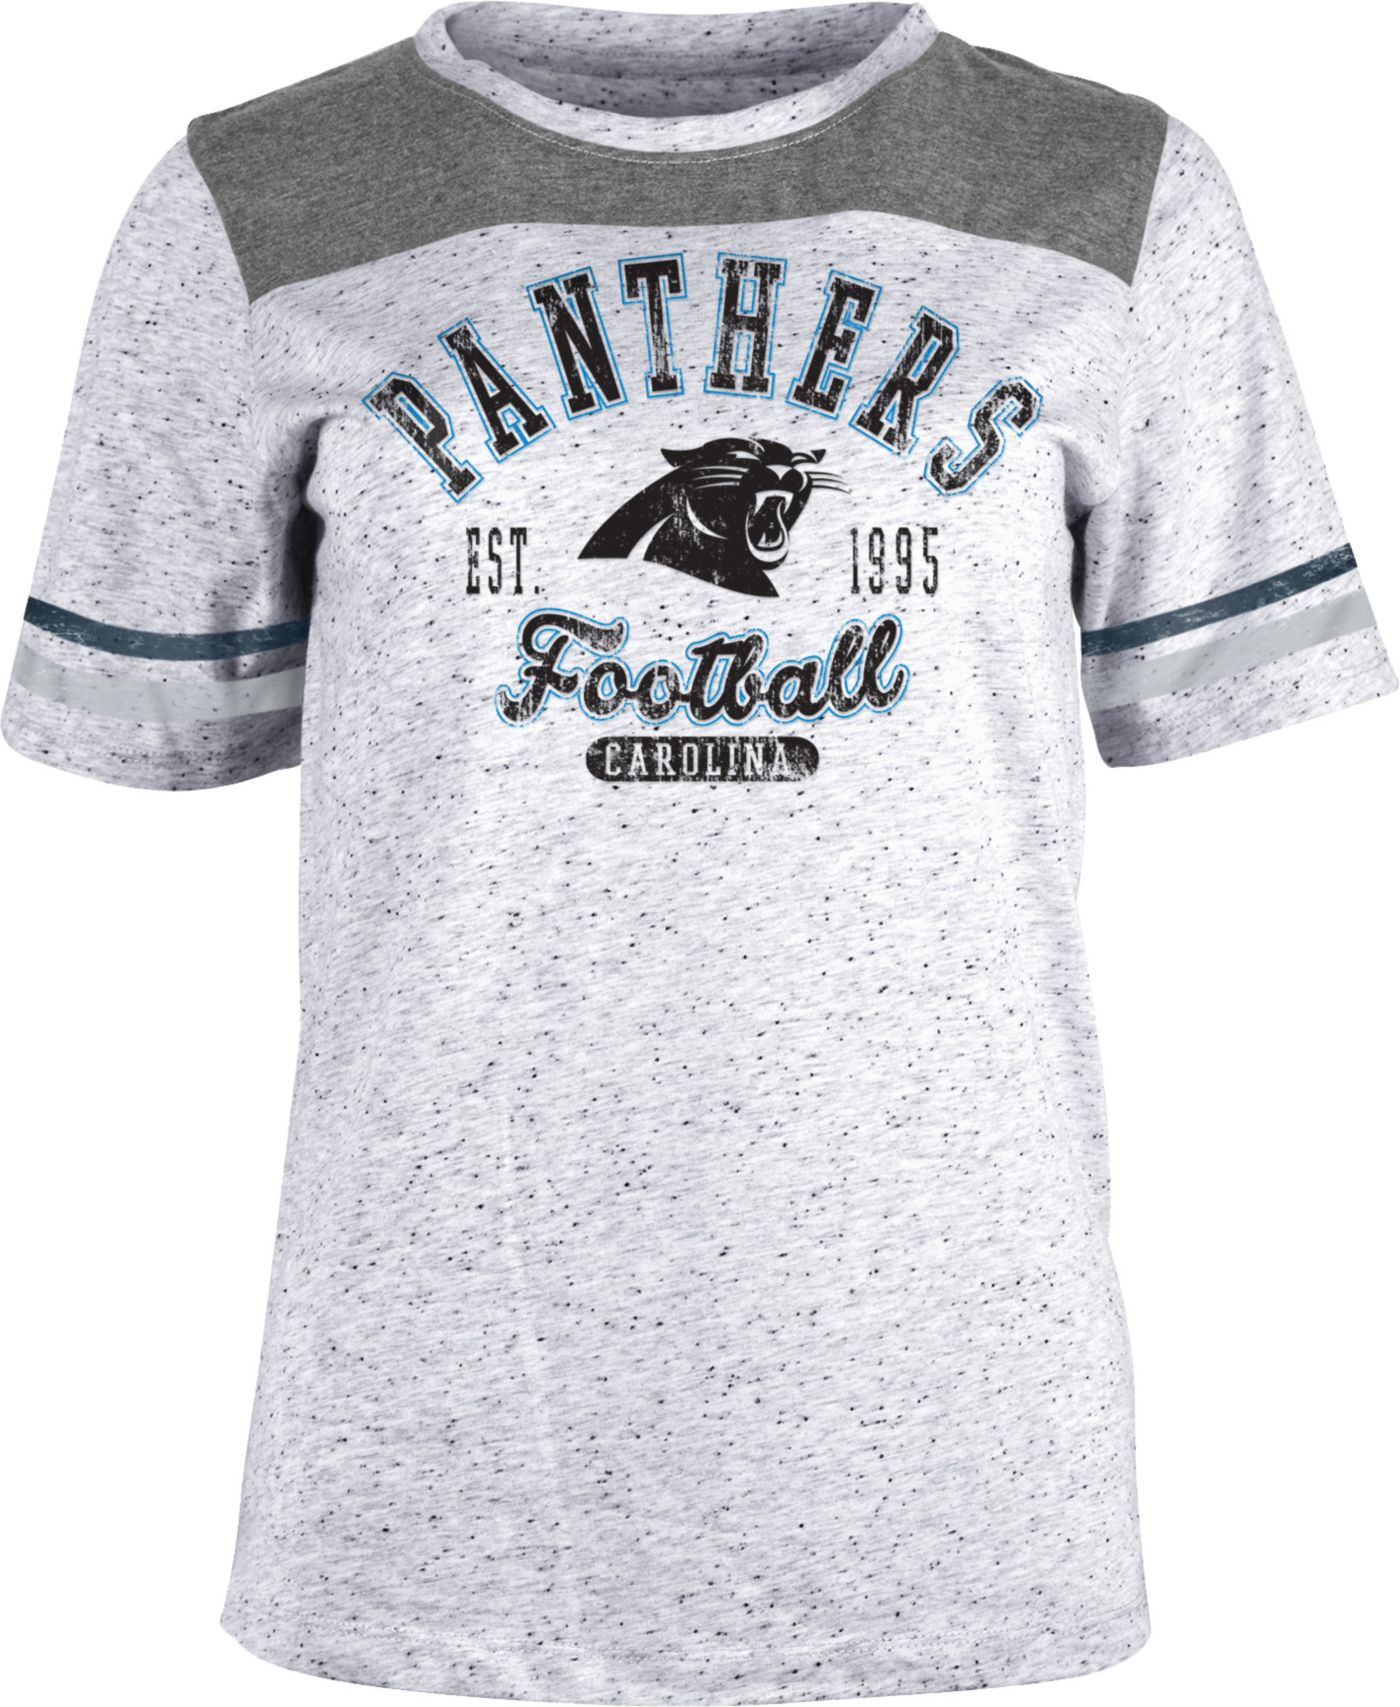 NFL Team Apparel Women's Carolina Panthers Peppercorn T-Shirt